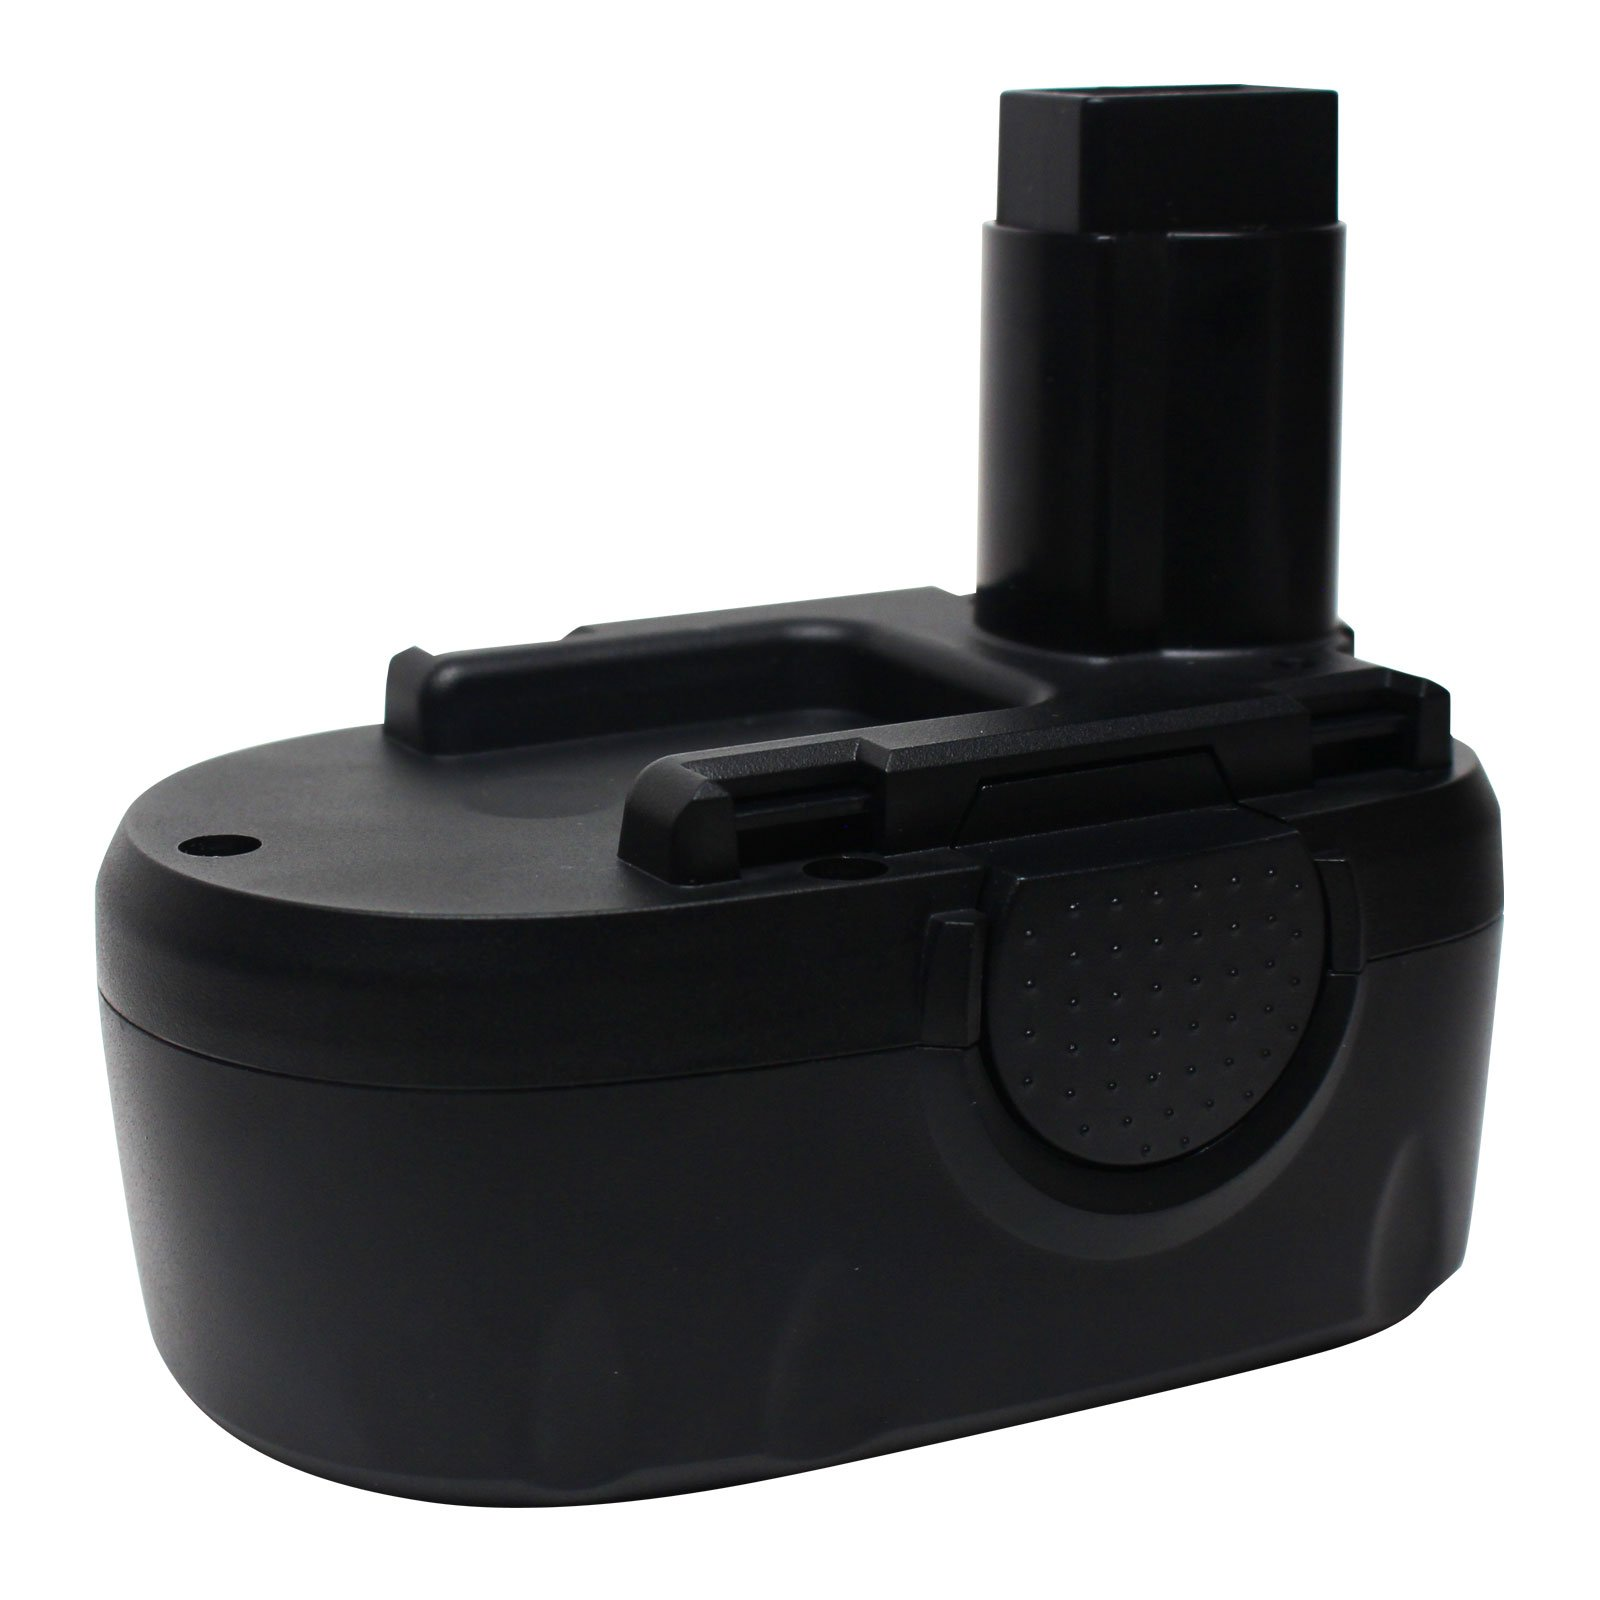 Cheap Worx Battery Mower Find Worx Battery Mower Deals On